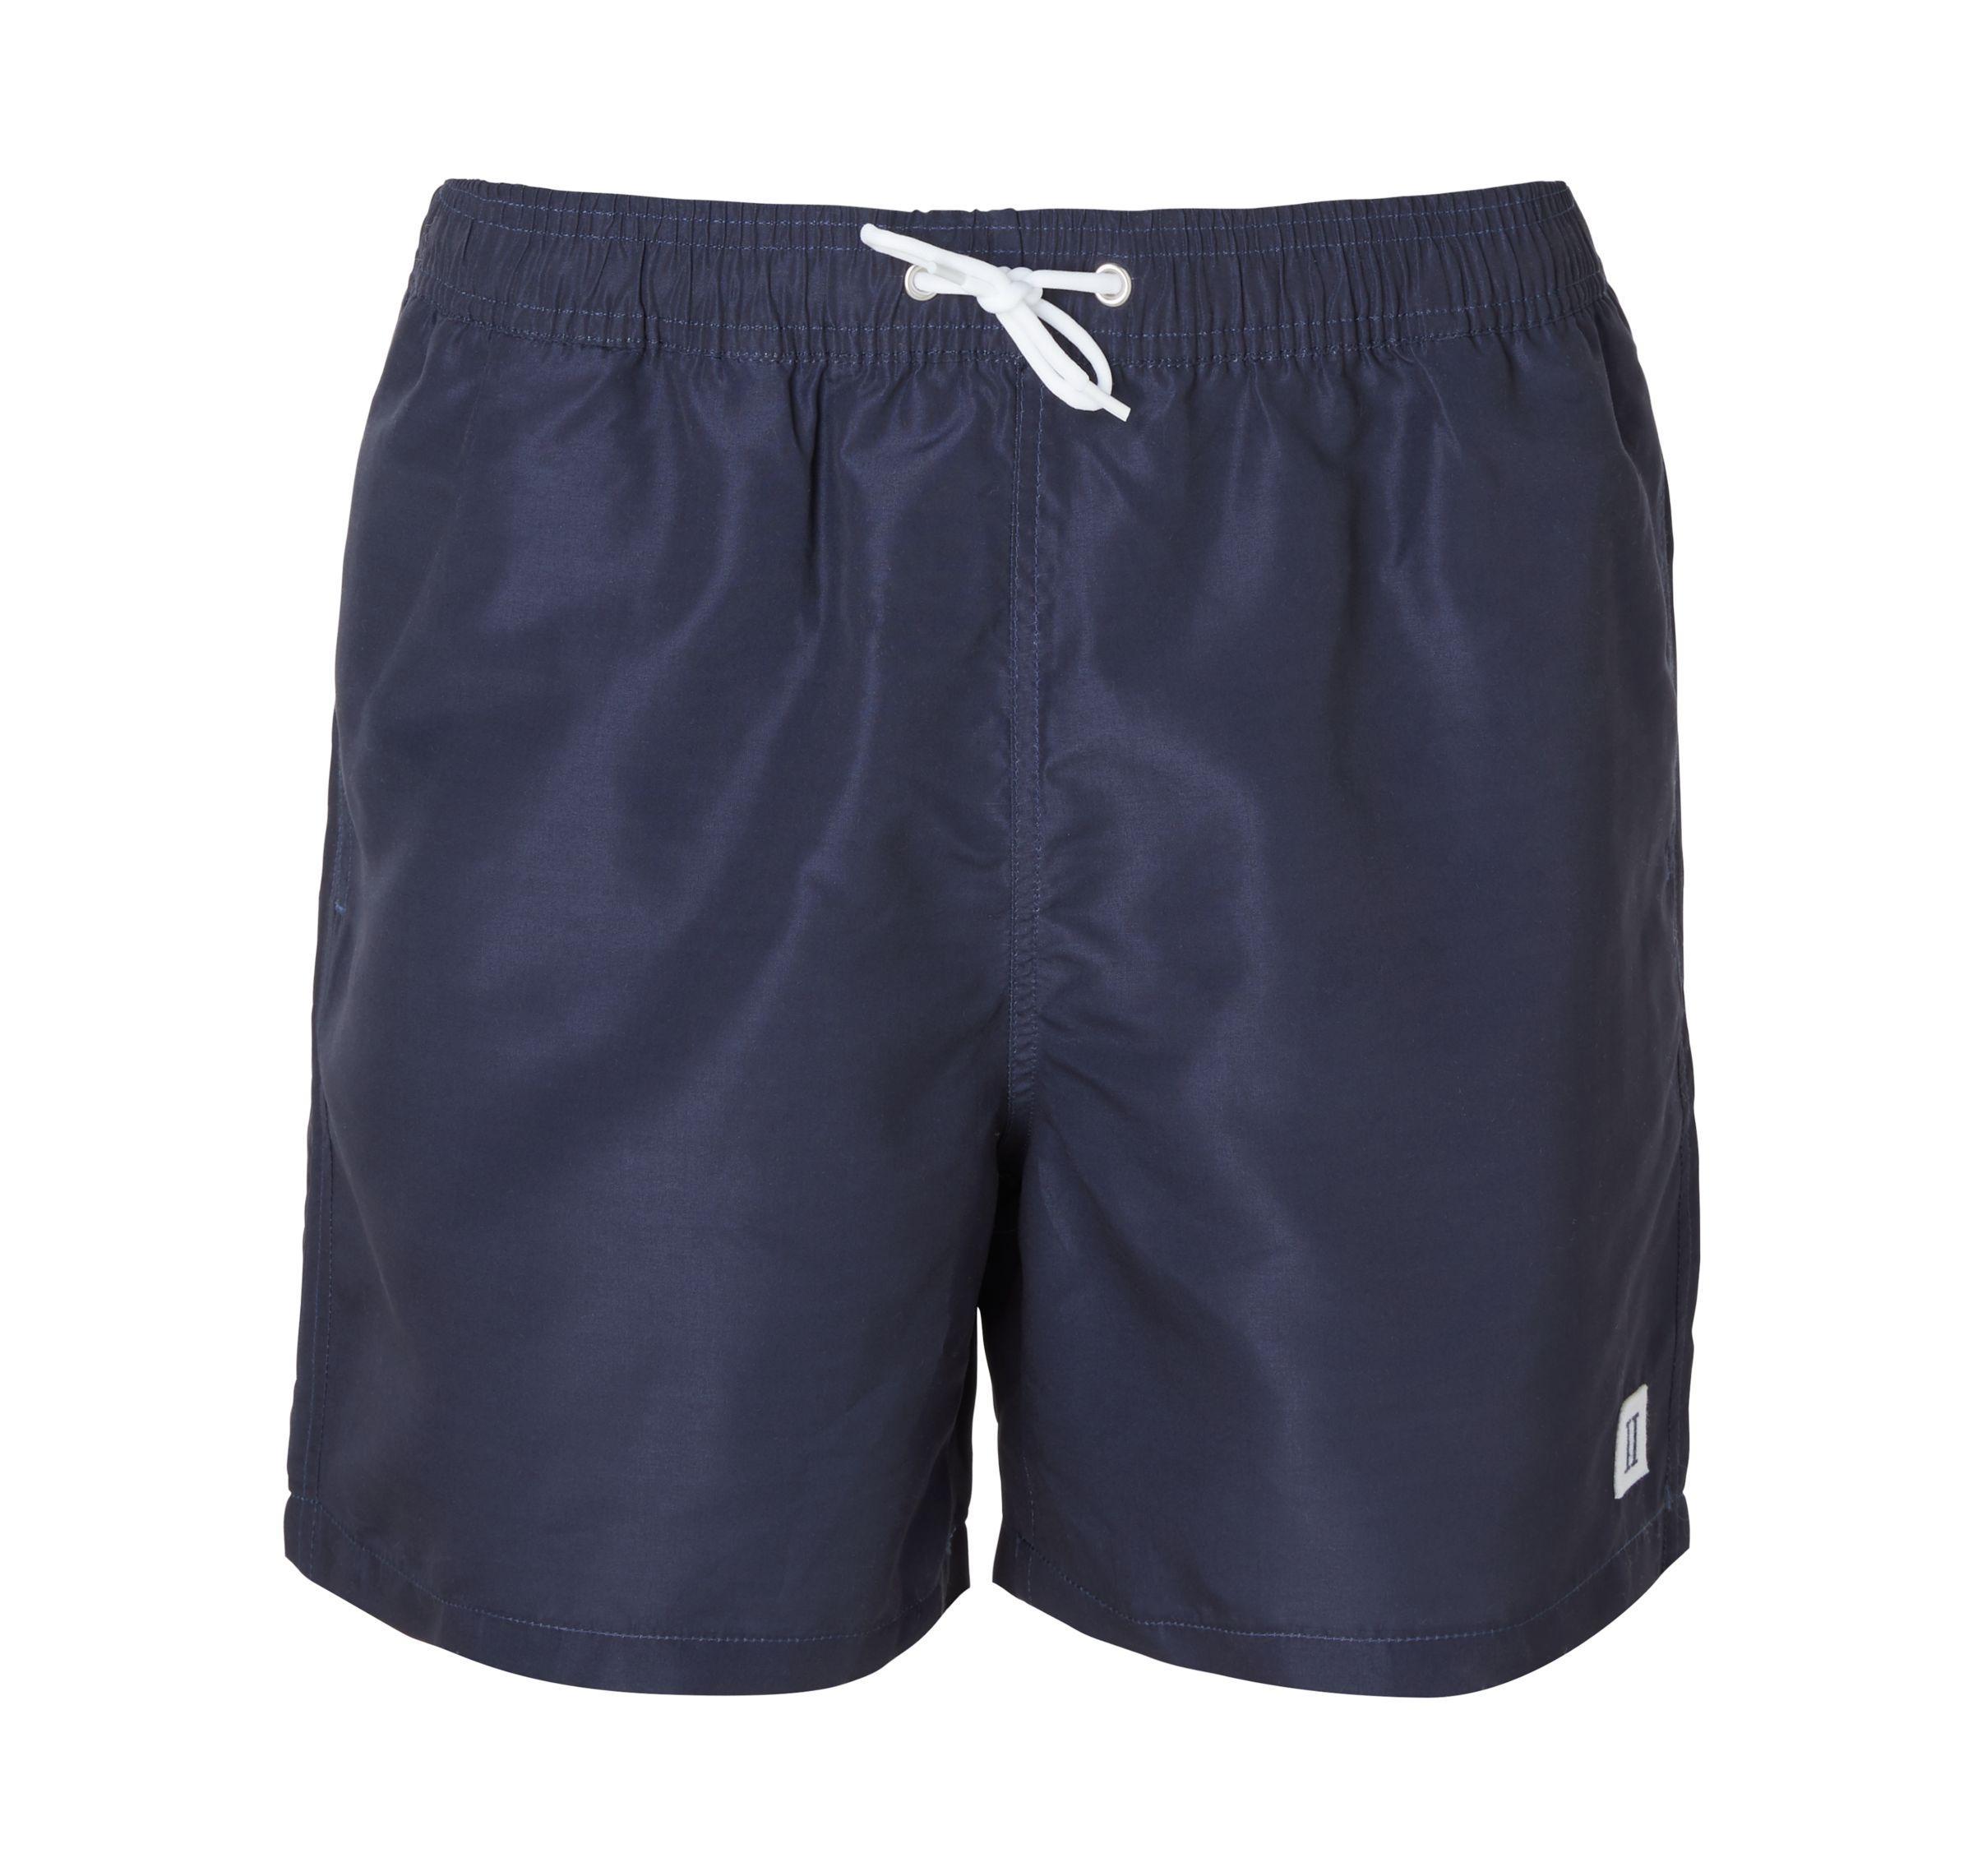 977cbdebe8 Les Deux Rivierra Swim Shorts Navy in Blue for Men - Save 2% - Lyst